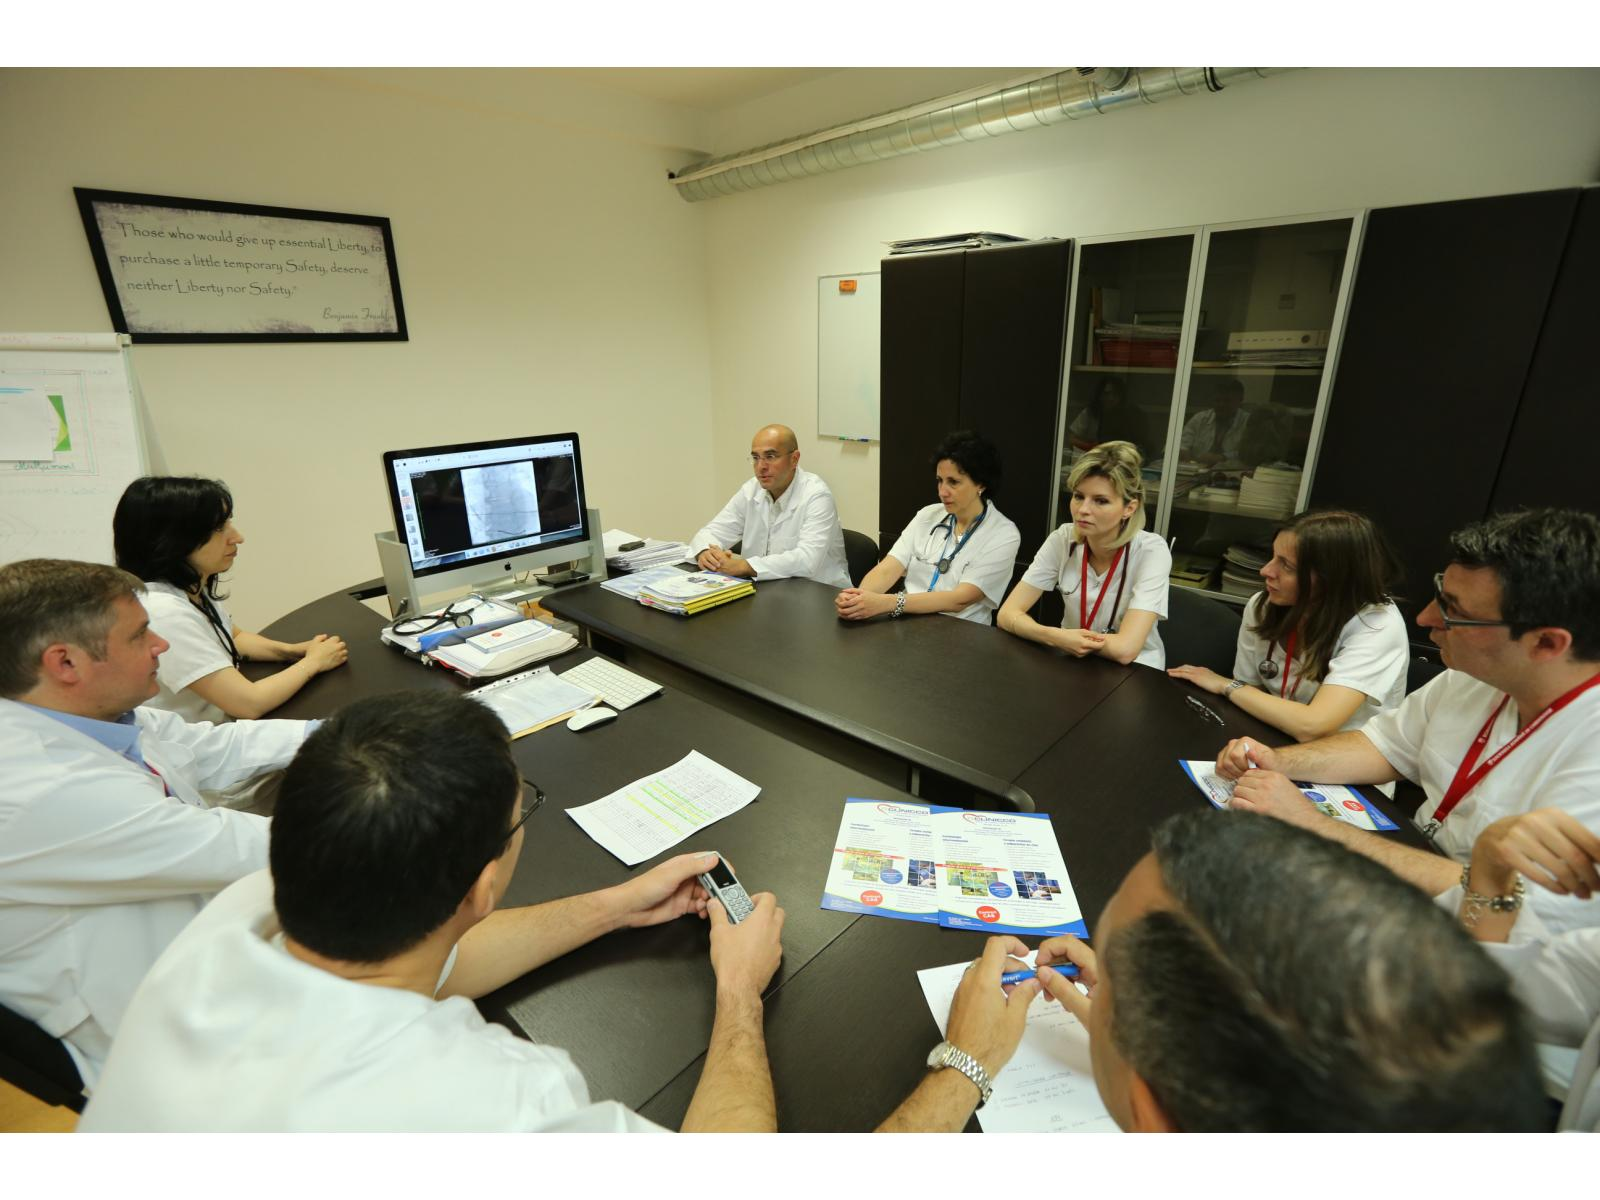 Spitalul de cardiologie CLINICCO - 1DX_7973.jpg